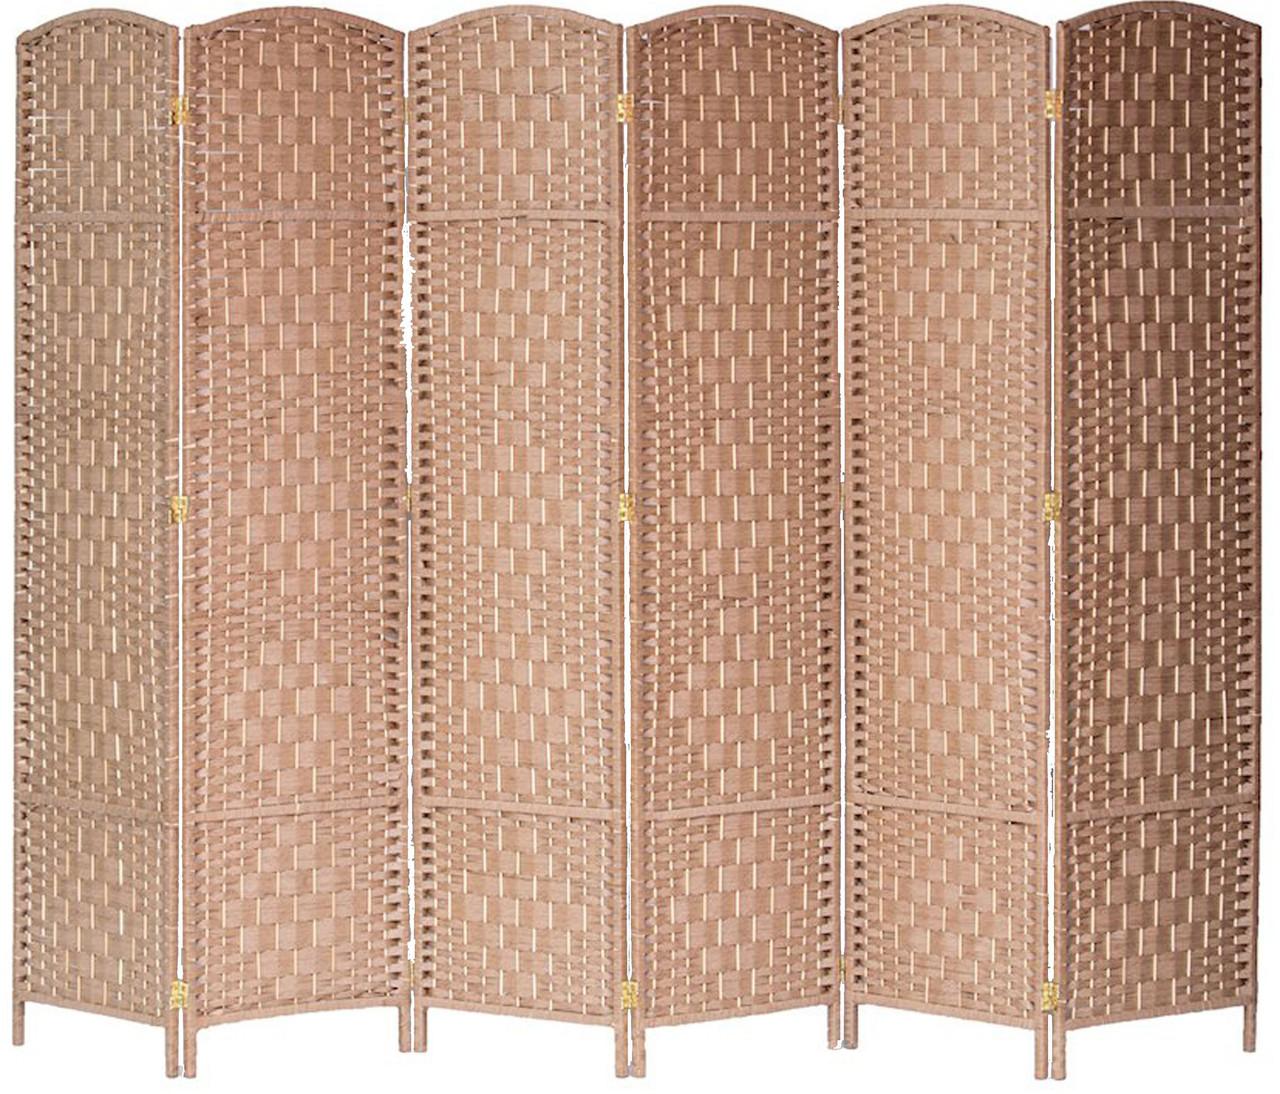 6 Panel Room Divider Privacy Screen Diamond Weave Fiber